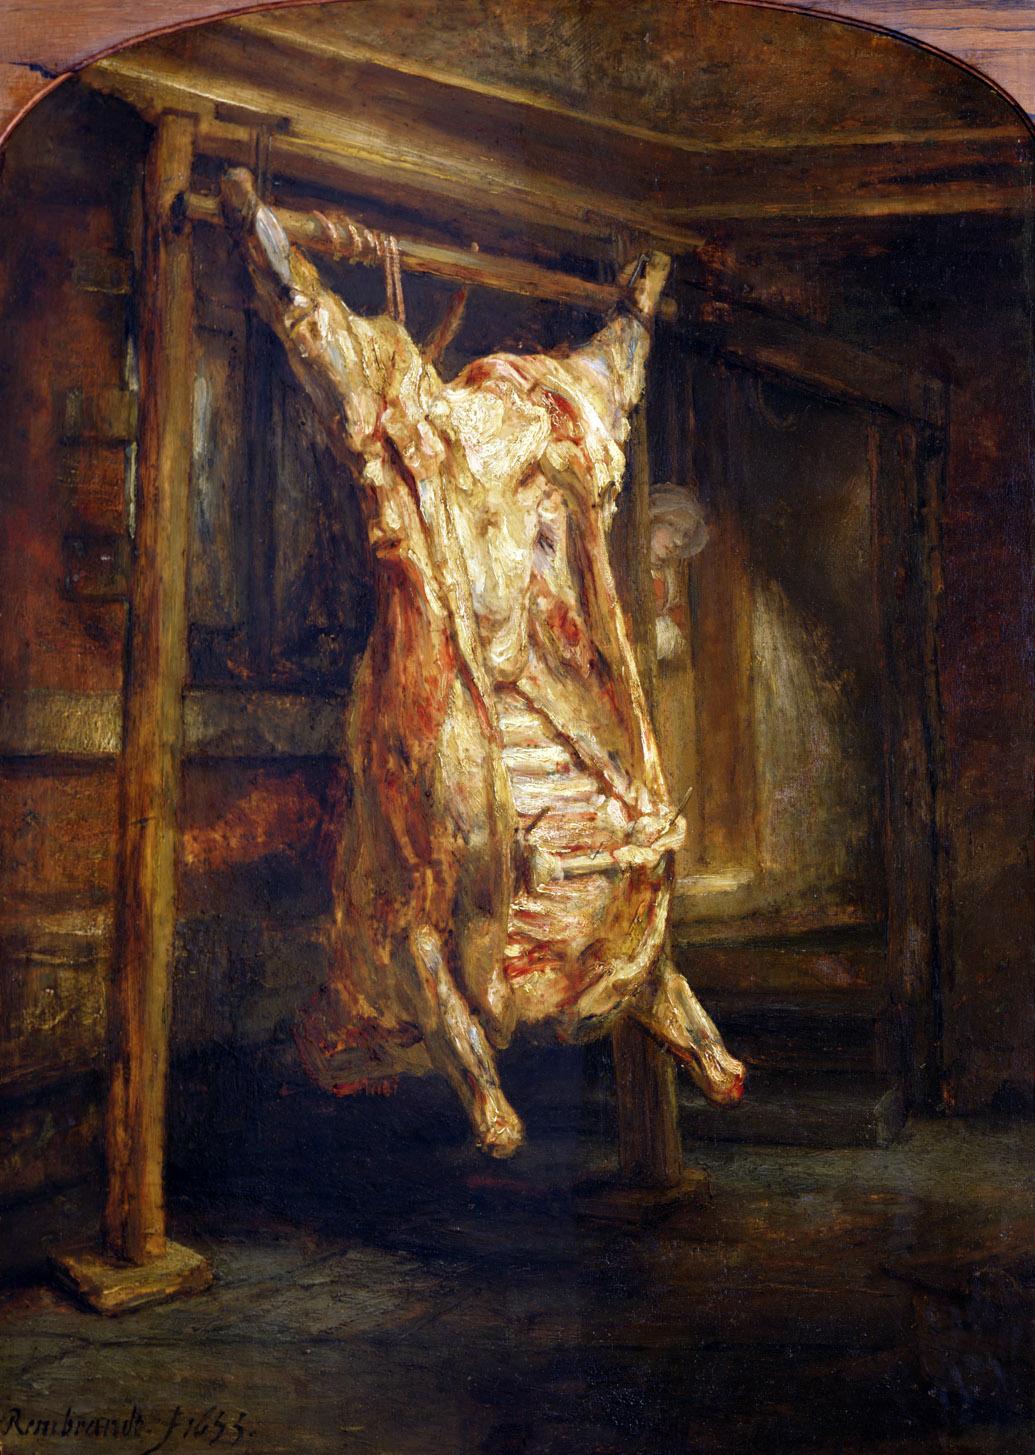 The Slaughtered Ox, by Rembrandt van Rijn, 1655. Louvre Museum, Paris.